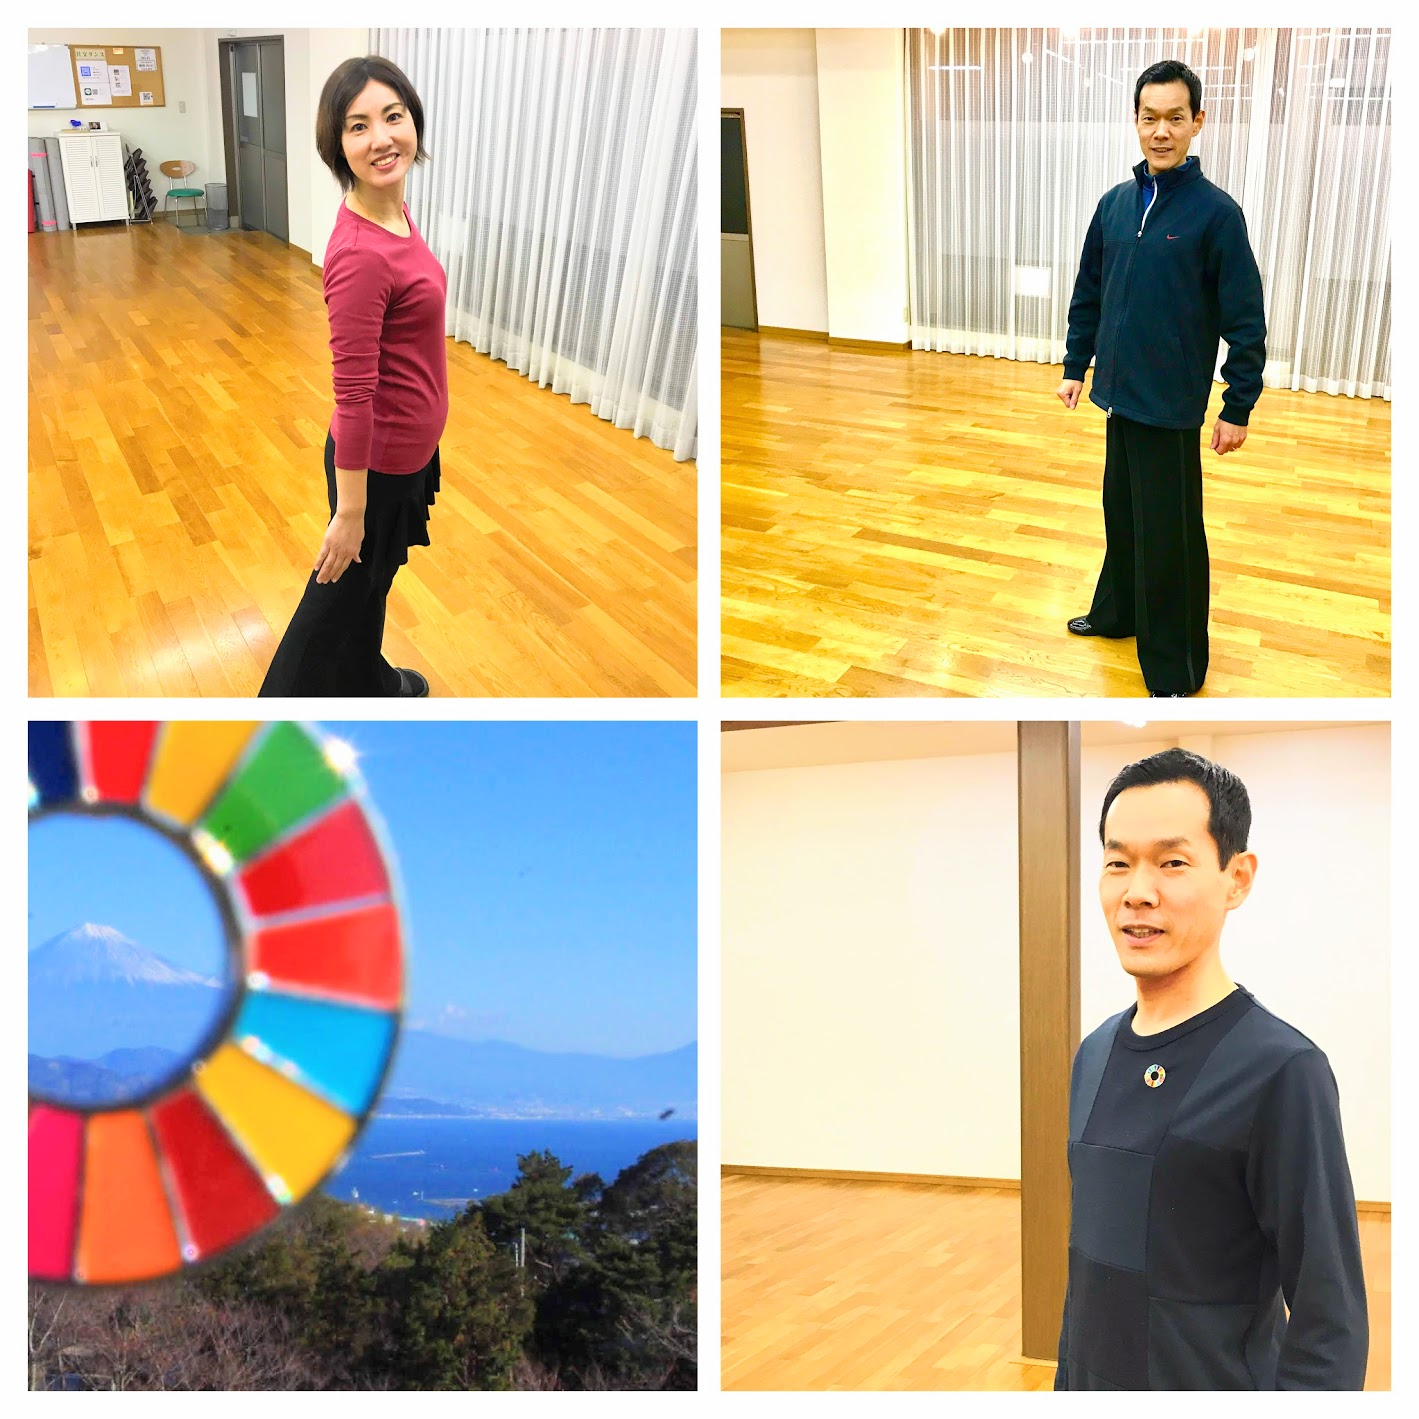 SDGs 静岡市 社交ダンス スポーツ